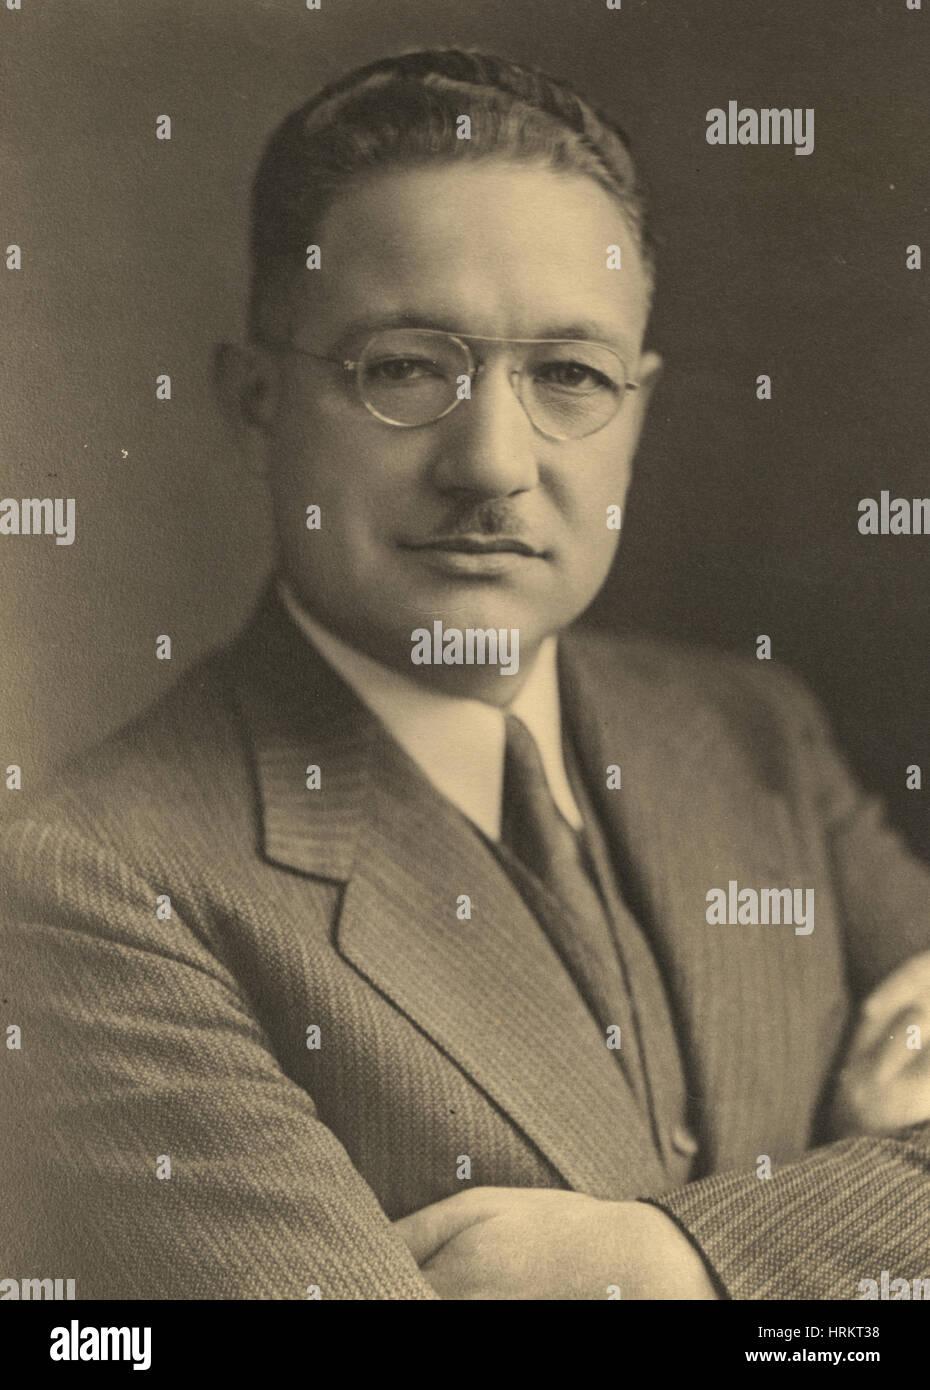 Fred Soper, American Epidemiologist - Stock Image